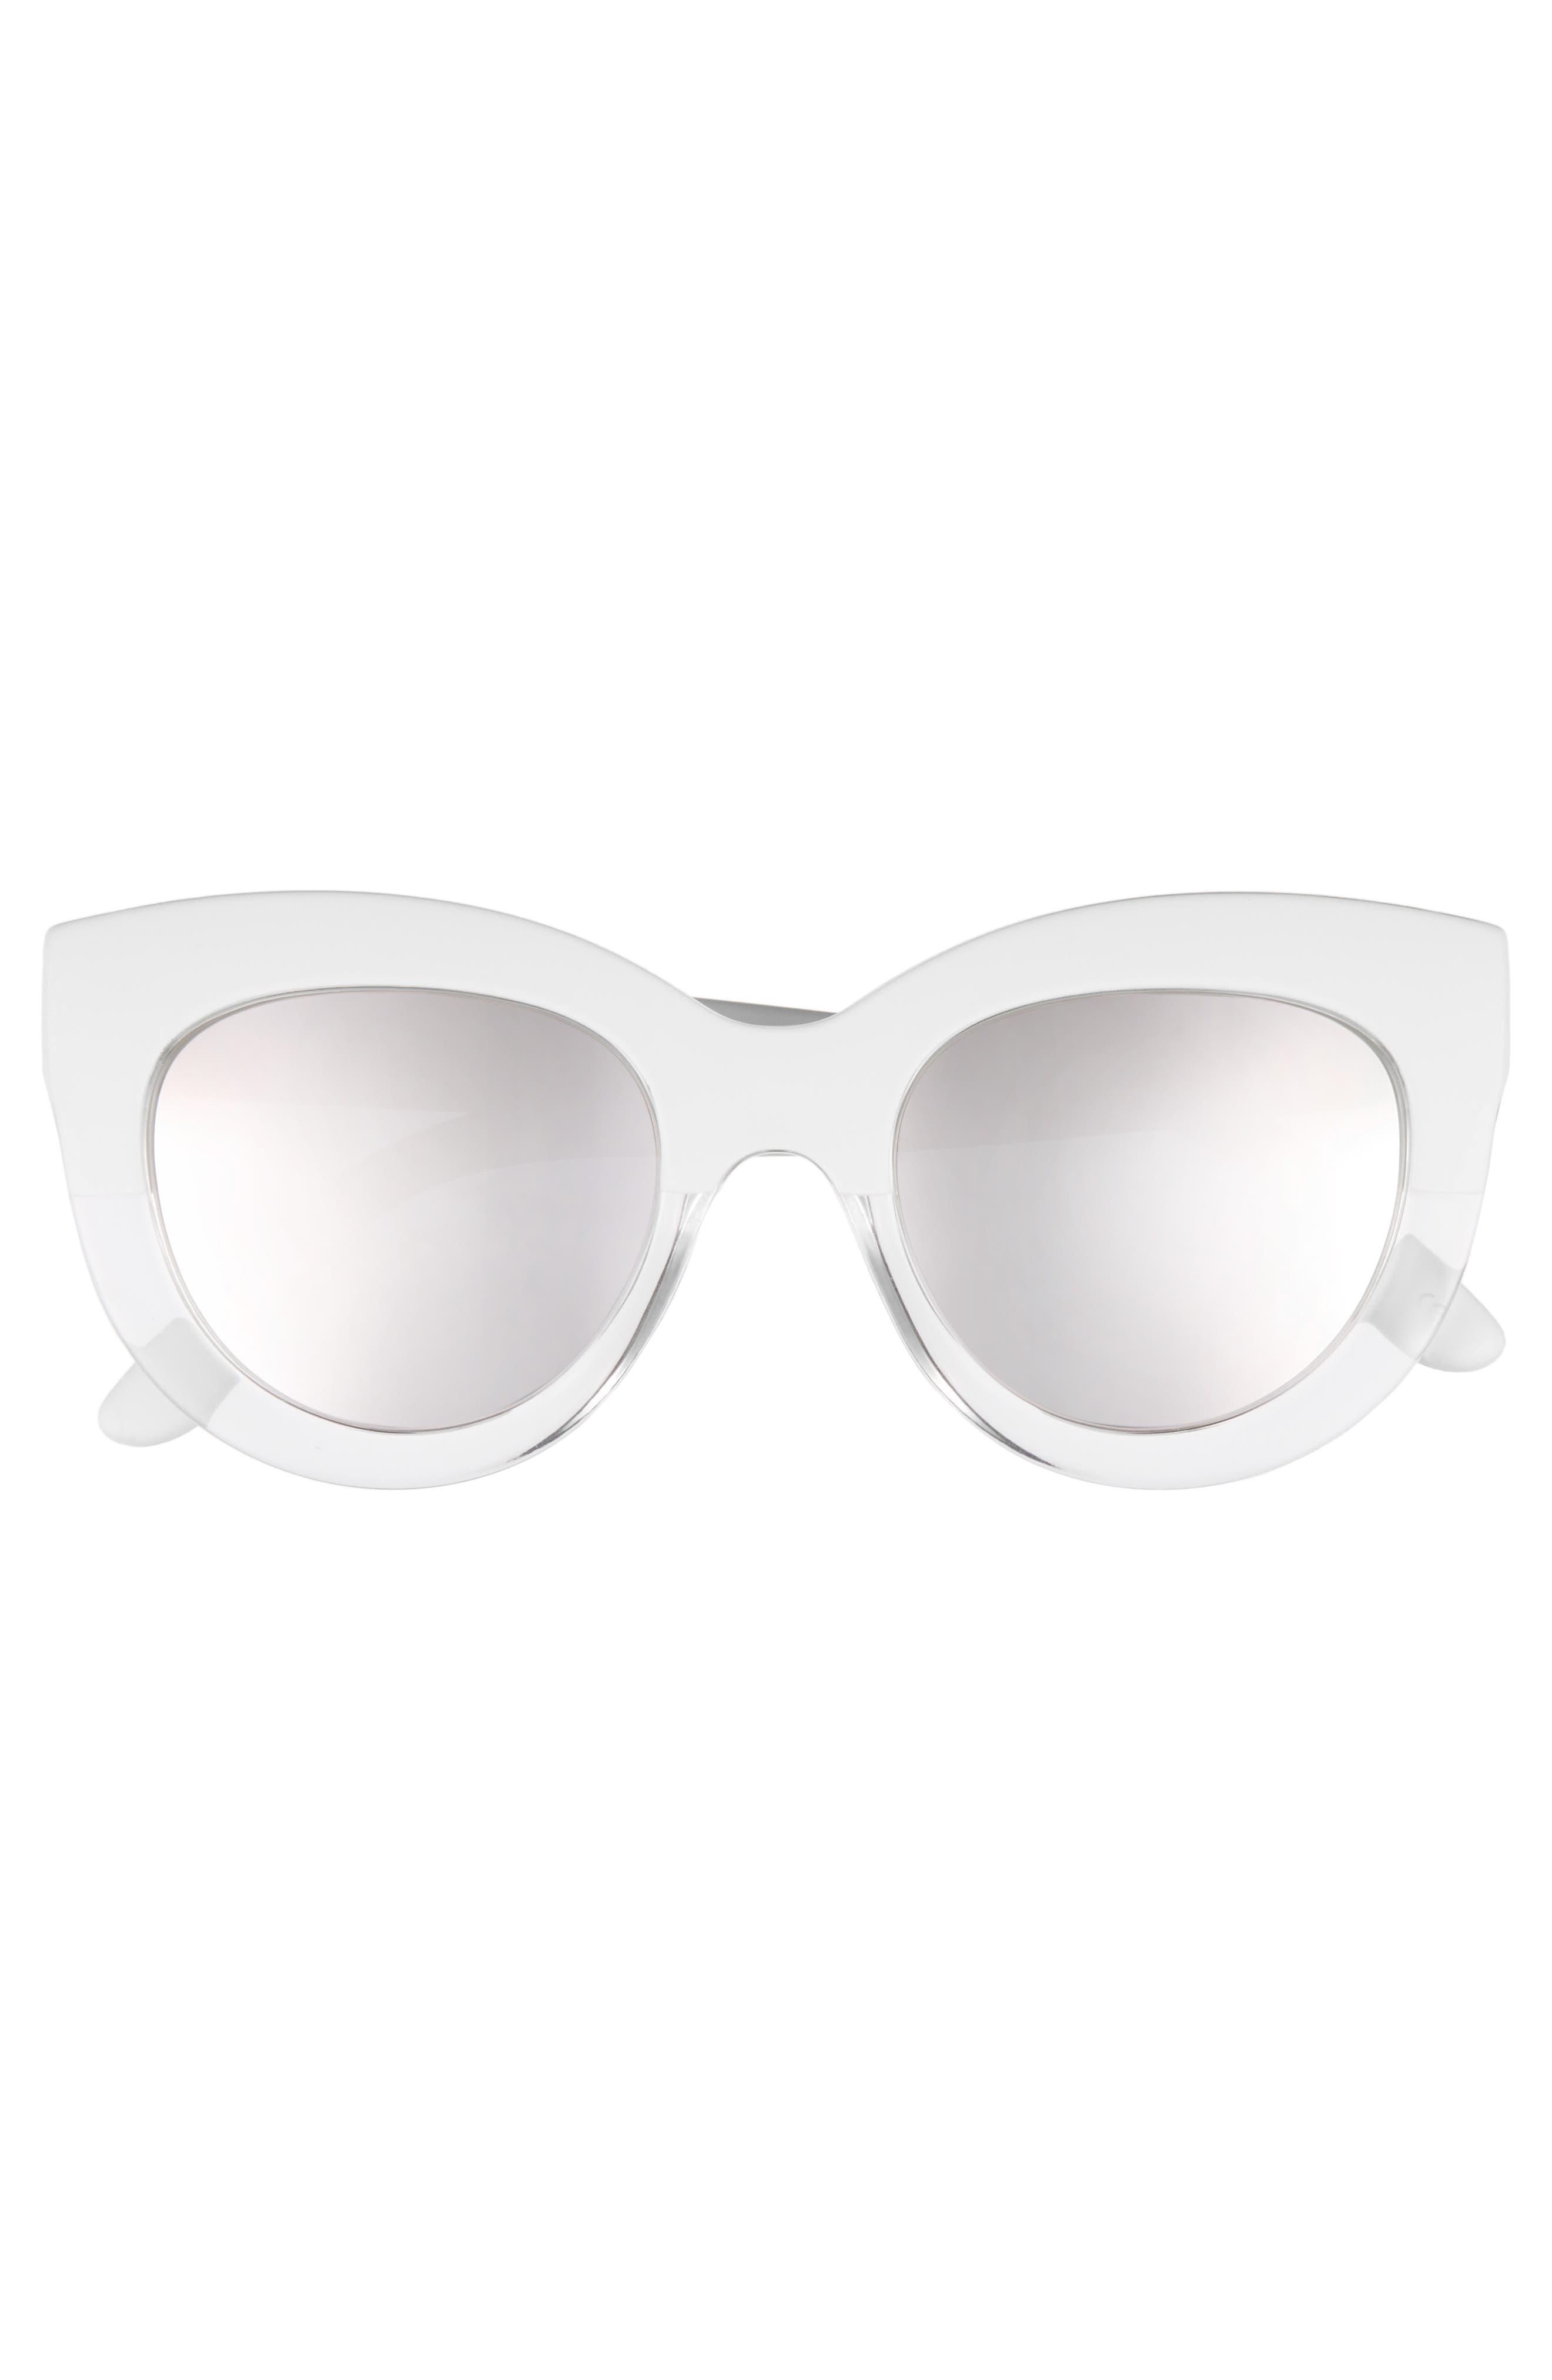 Tortola V2 51mm Polarized Cat Eye Sunglasses,                             Alternate thumbnail 6, color,